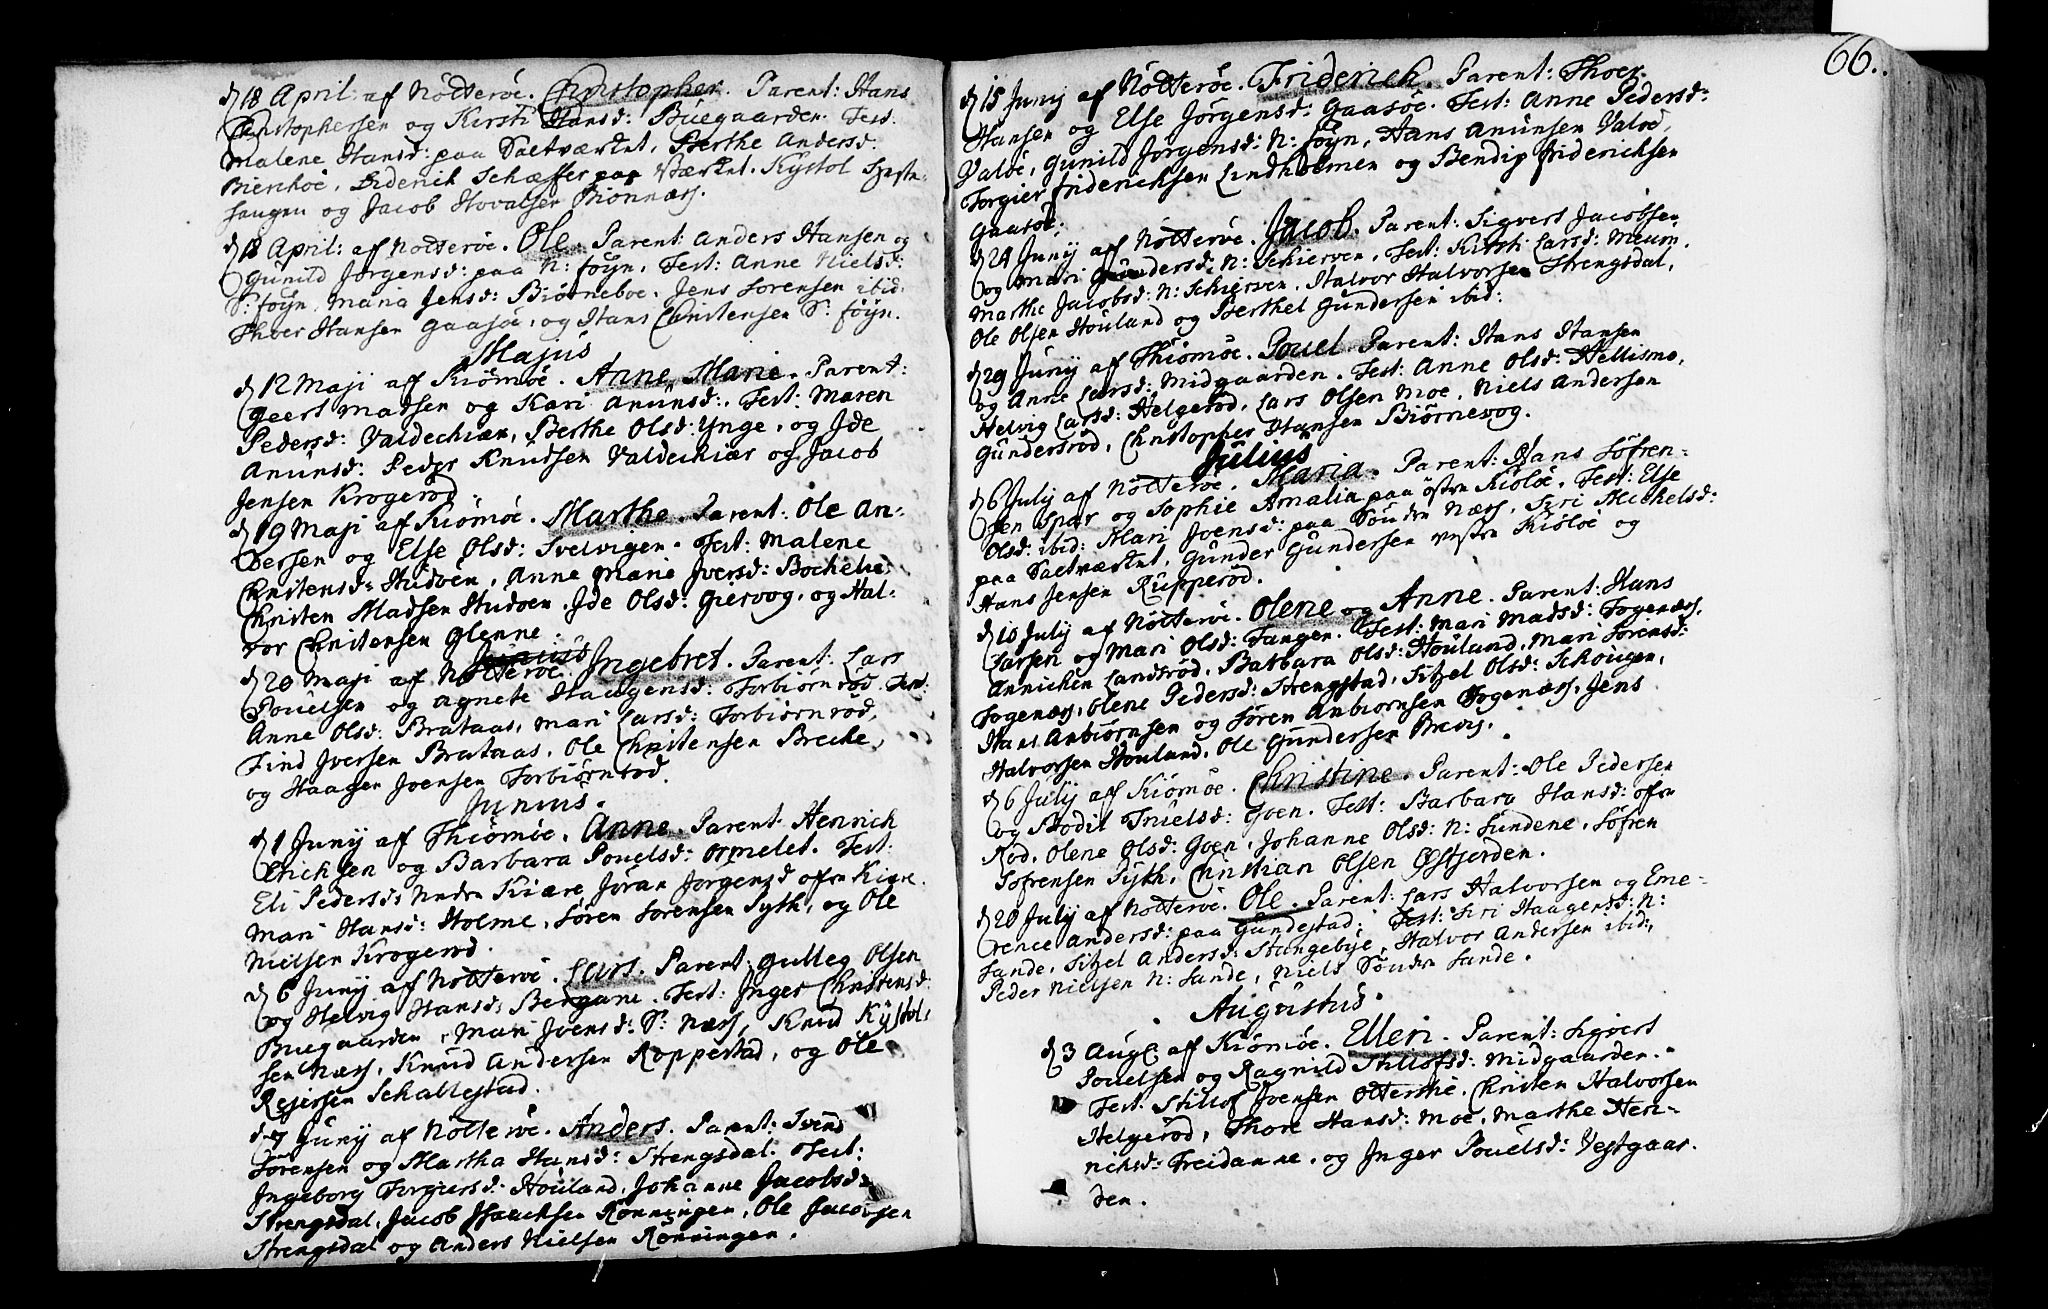 SAKO, Nøtterøy kirkebøker, F/Fa/L0002: Ministerialbok nr. I 2, 1738-1790, s. 66